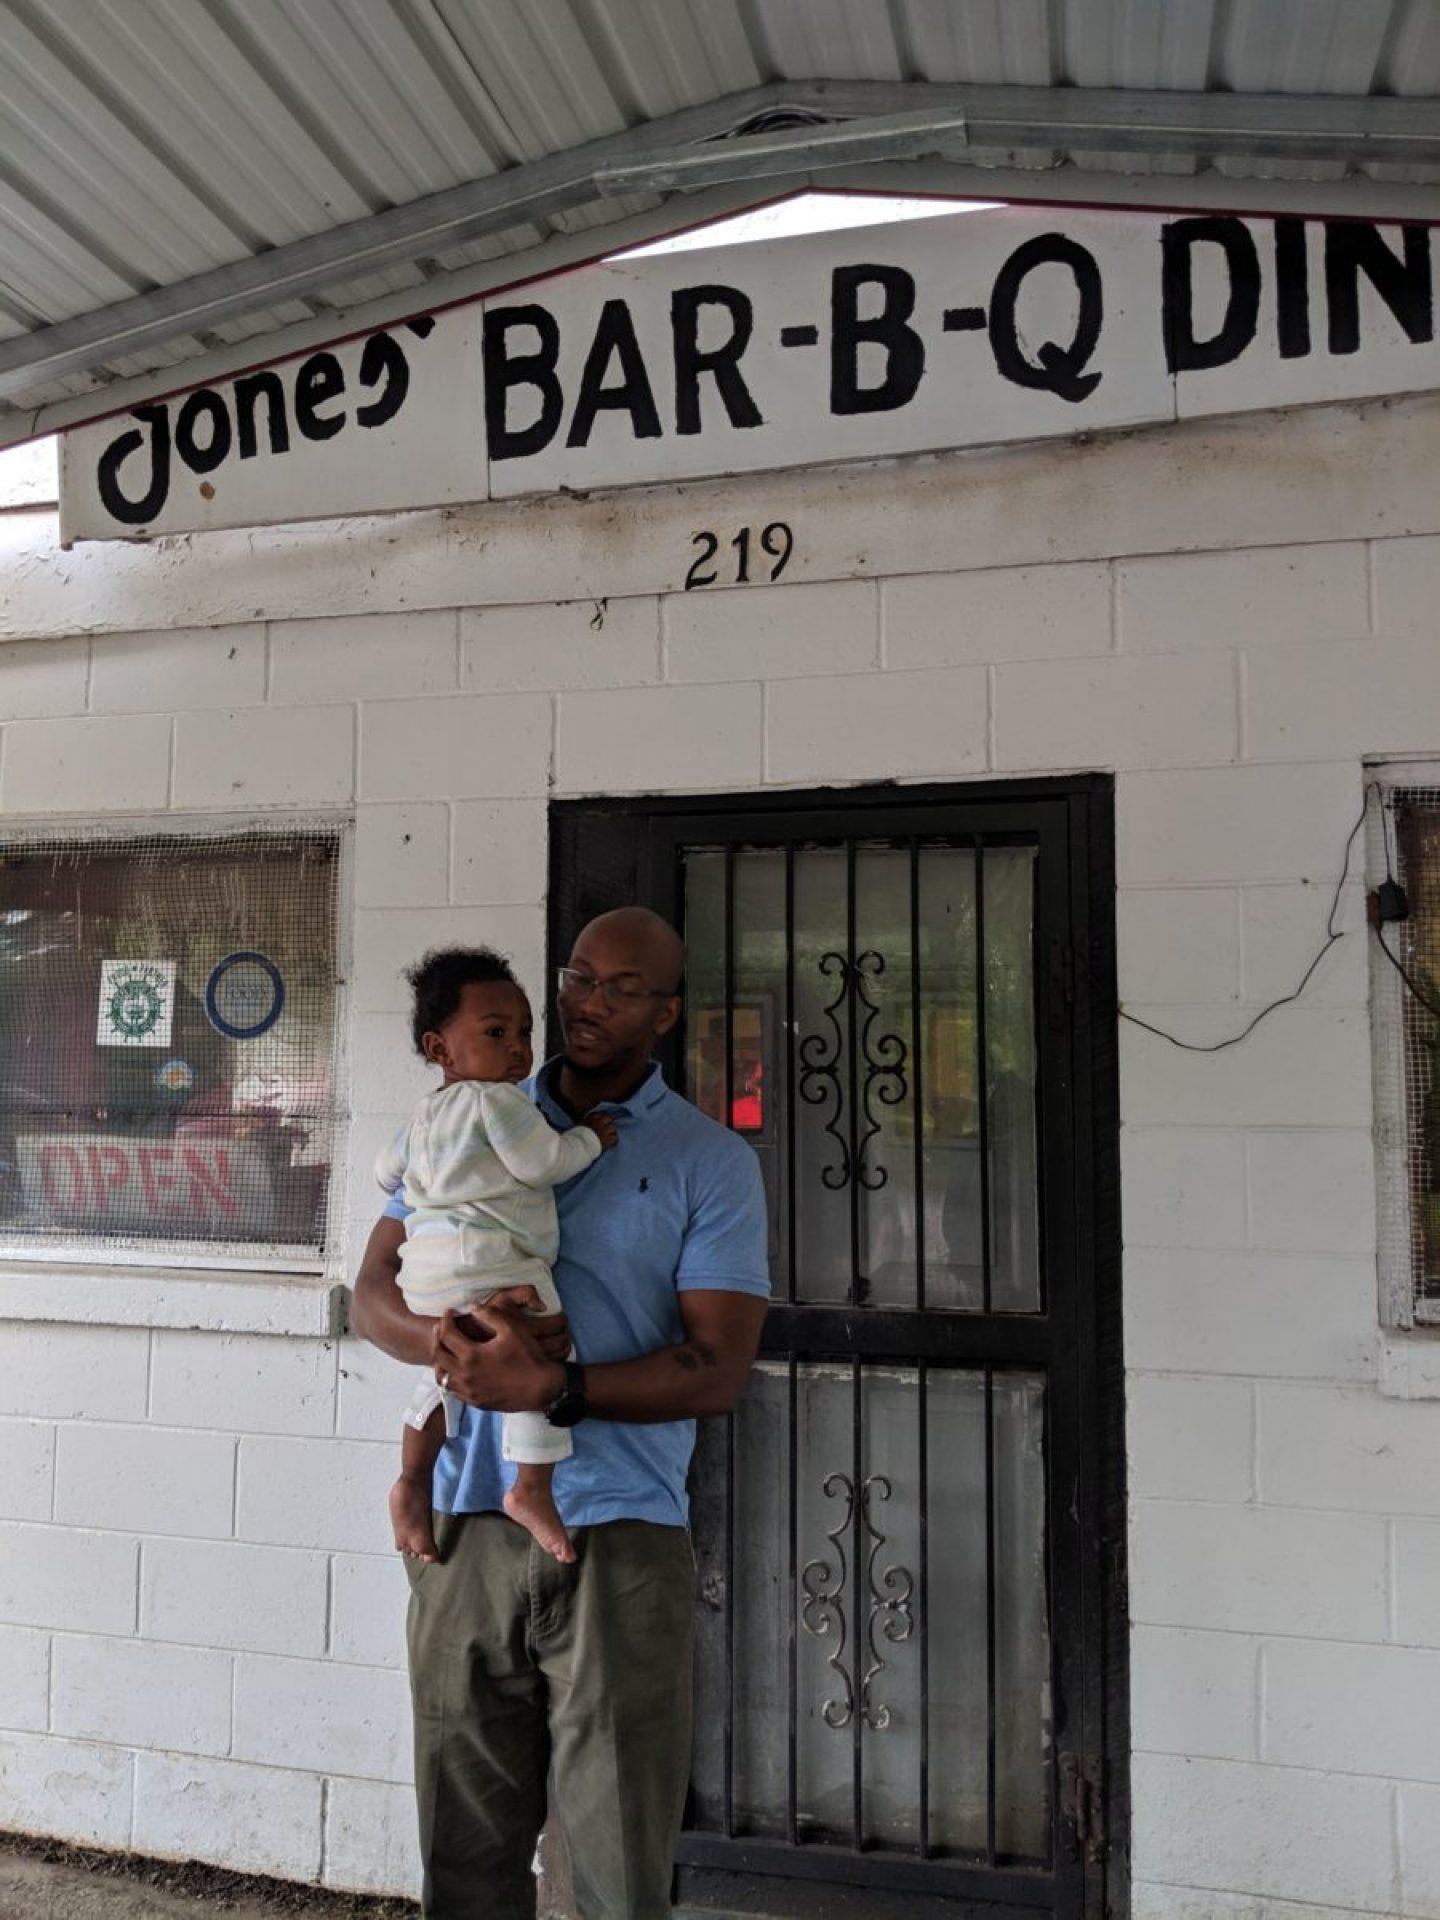 MVIMG_20190503_123451-1440x1920 Arkansas Delta Family Road Trip:  Black Heritage, Art & More!